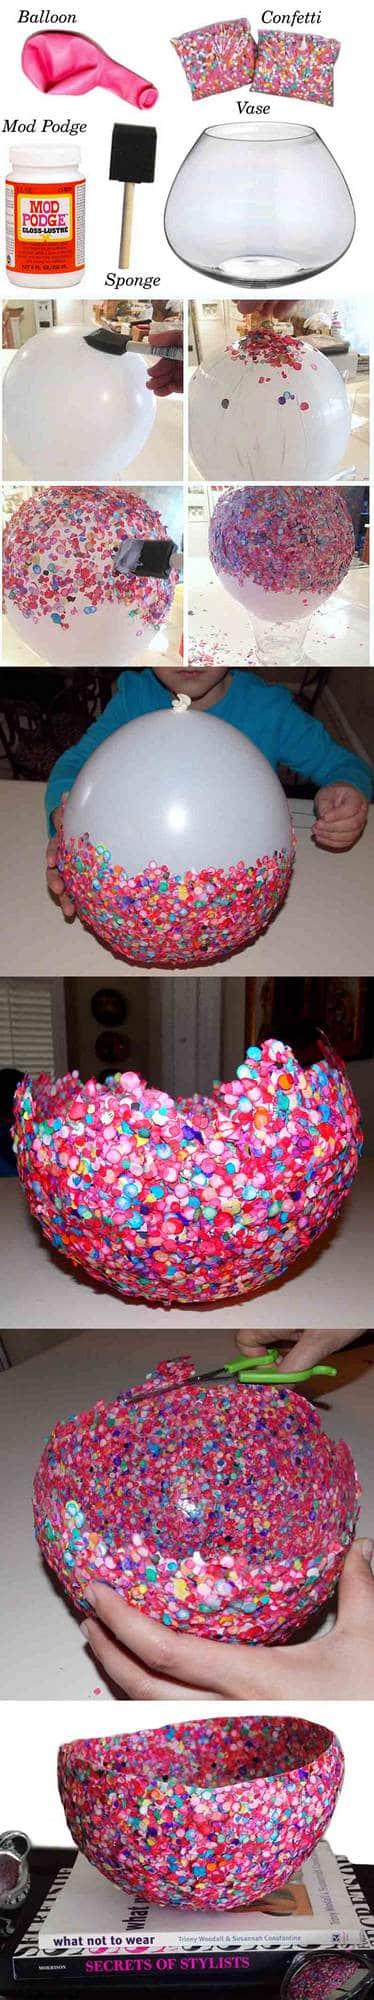 confeti bowl